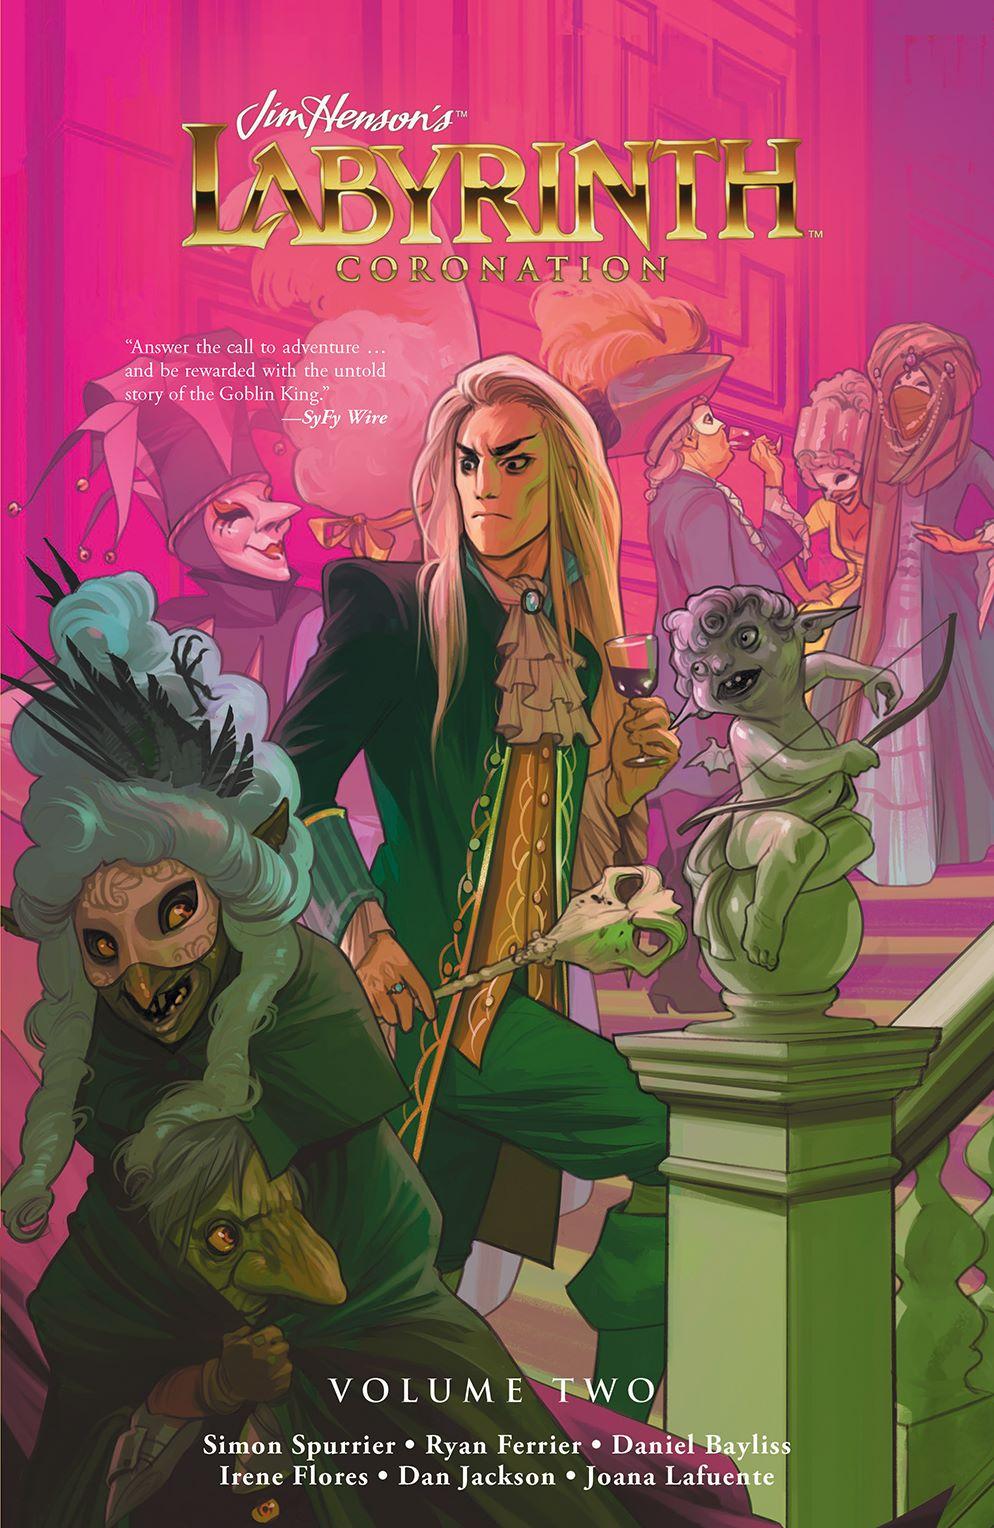 LabyrinthCoronation_v2_SC_Cover ComicList Previews: JIM HENSON'S LABYRINTH CORONATION VOLUME 2 TP